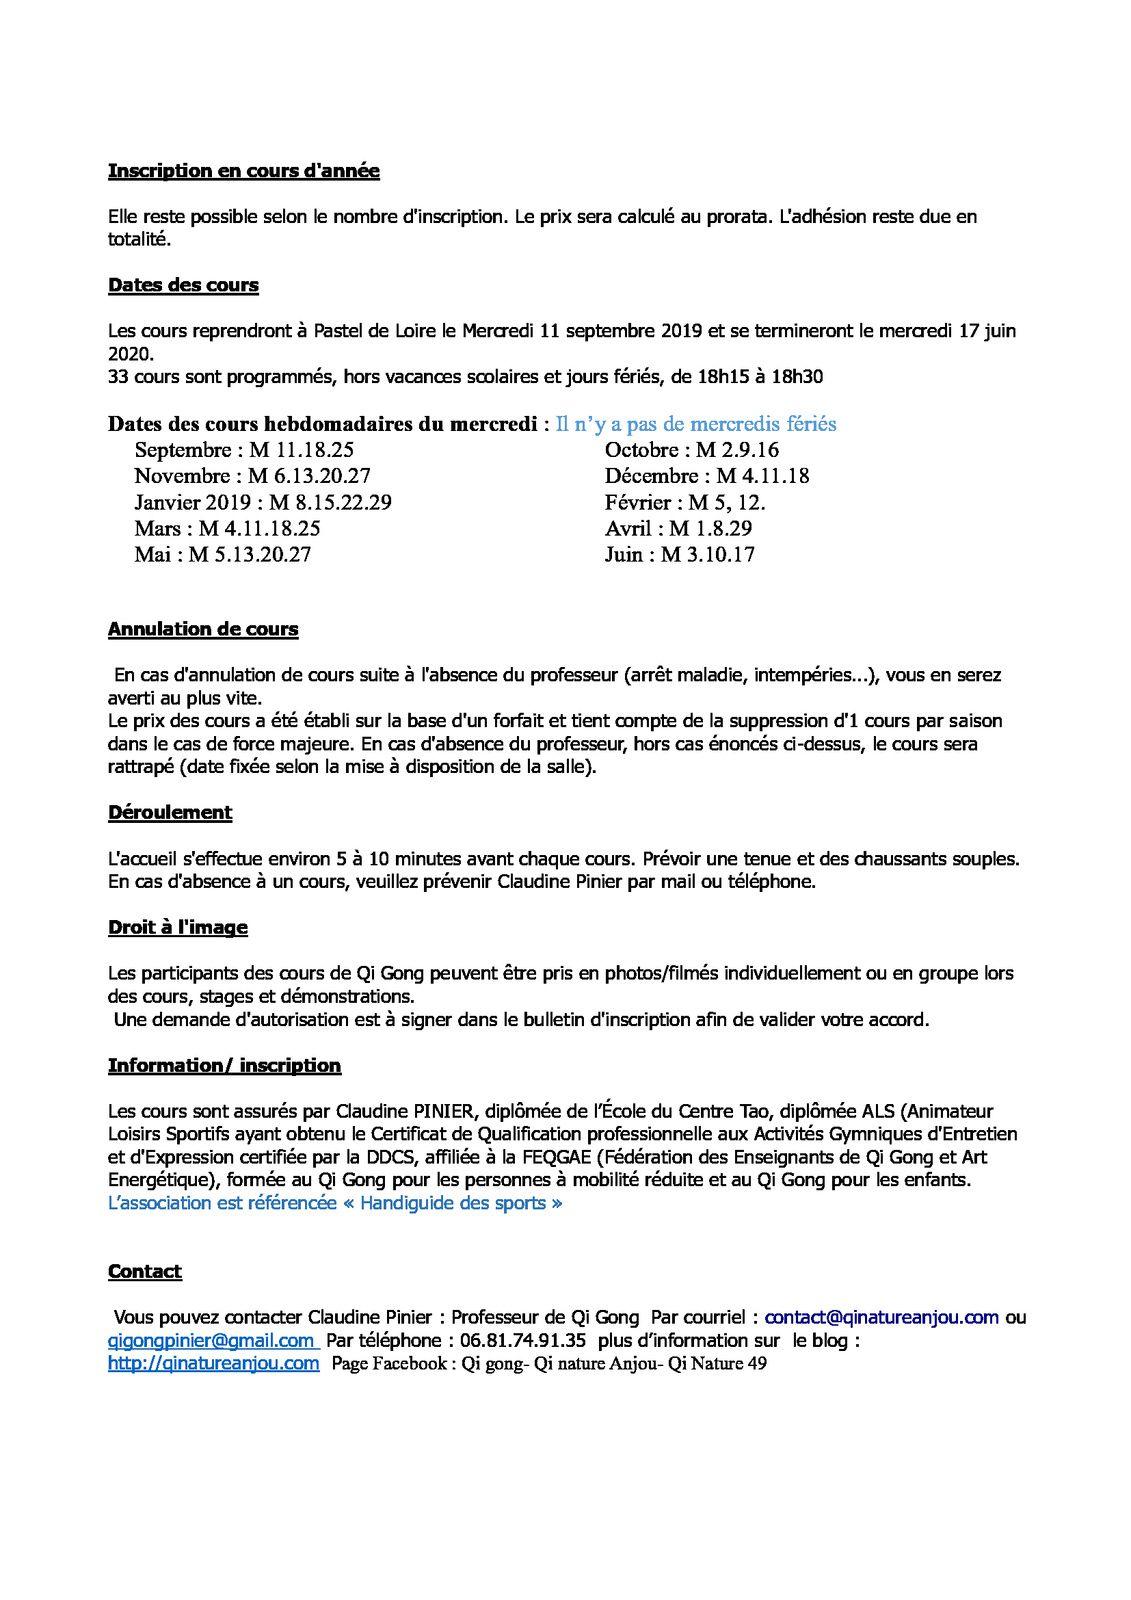 SAISON 2019 / 2020 Bouchemaine